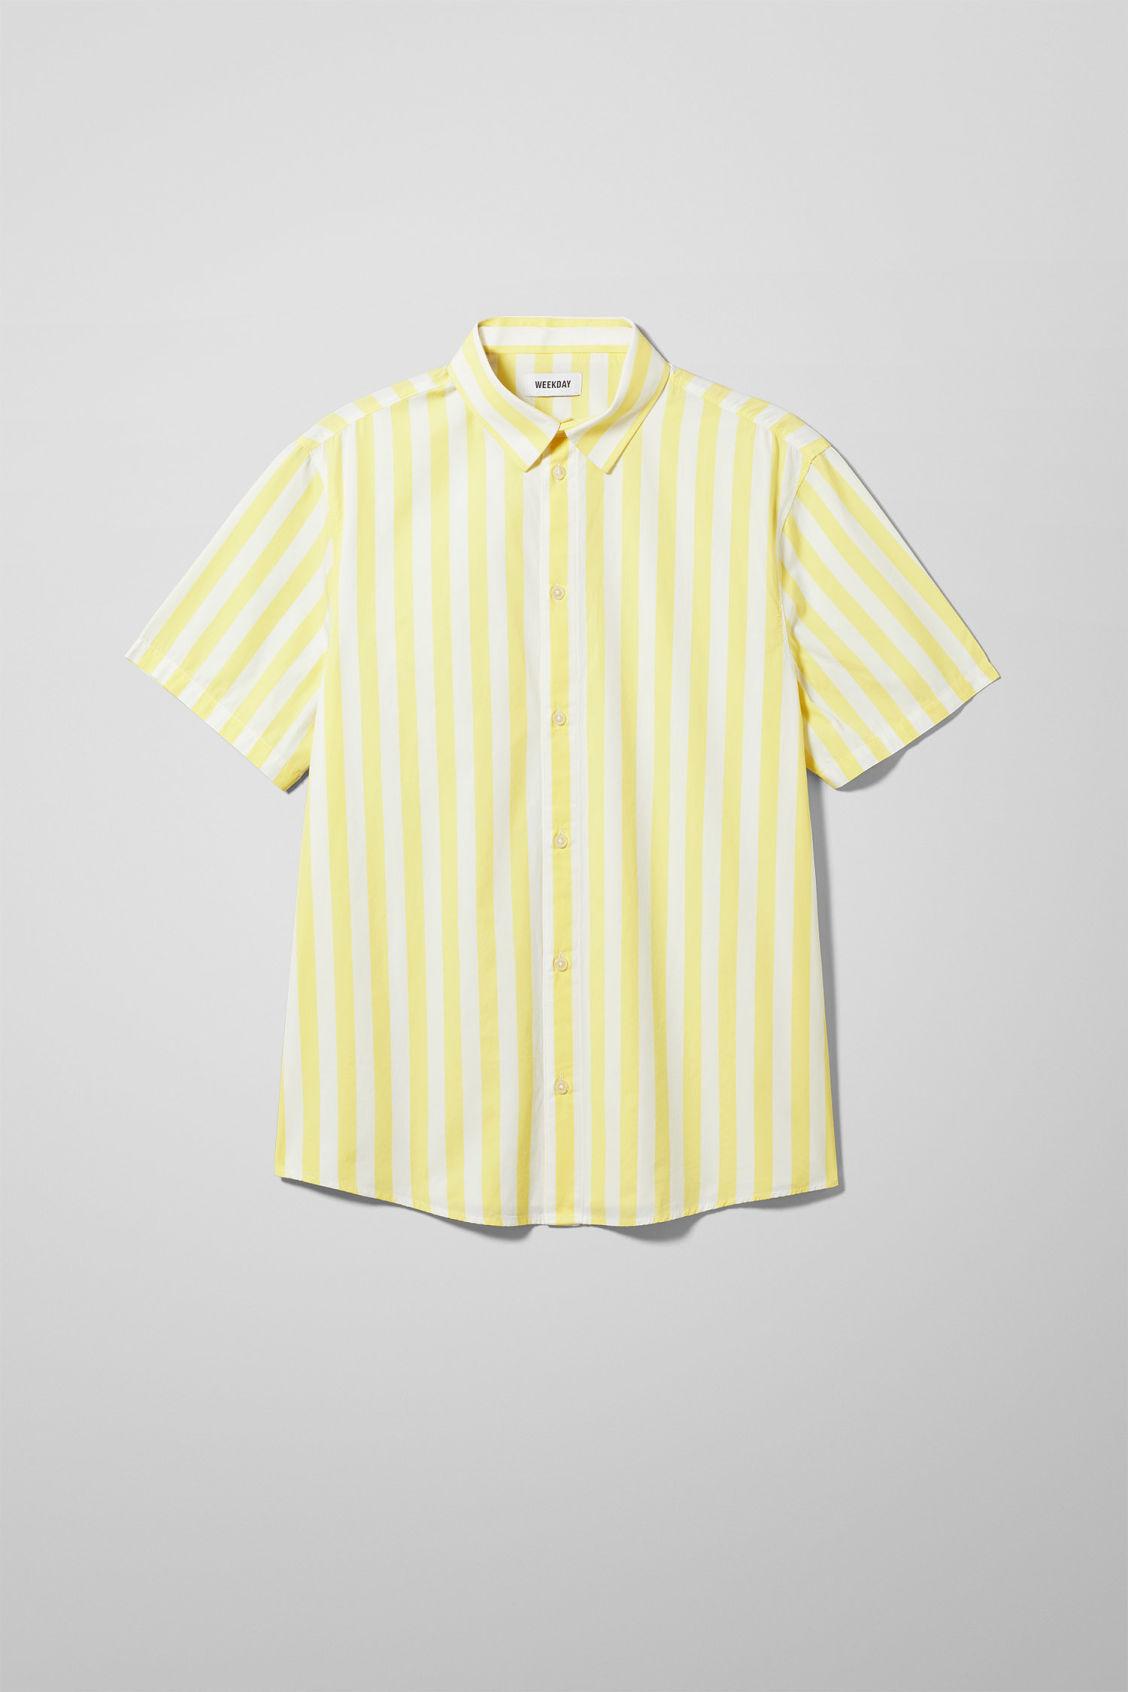 Louis Striped Short Sleeve Shirt - Yellow